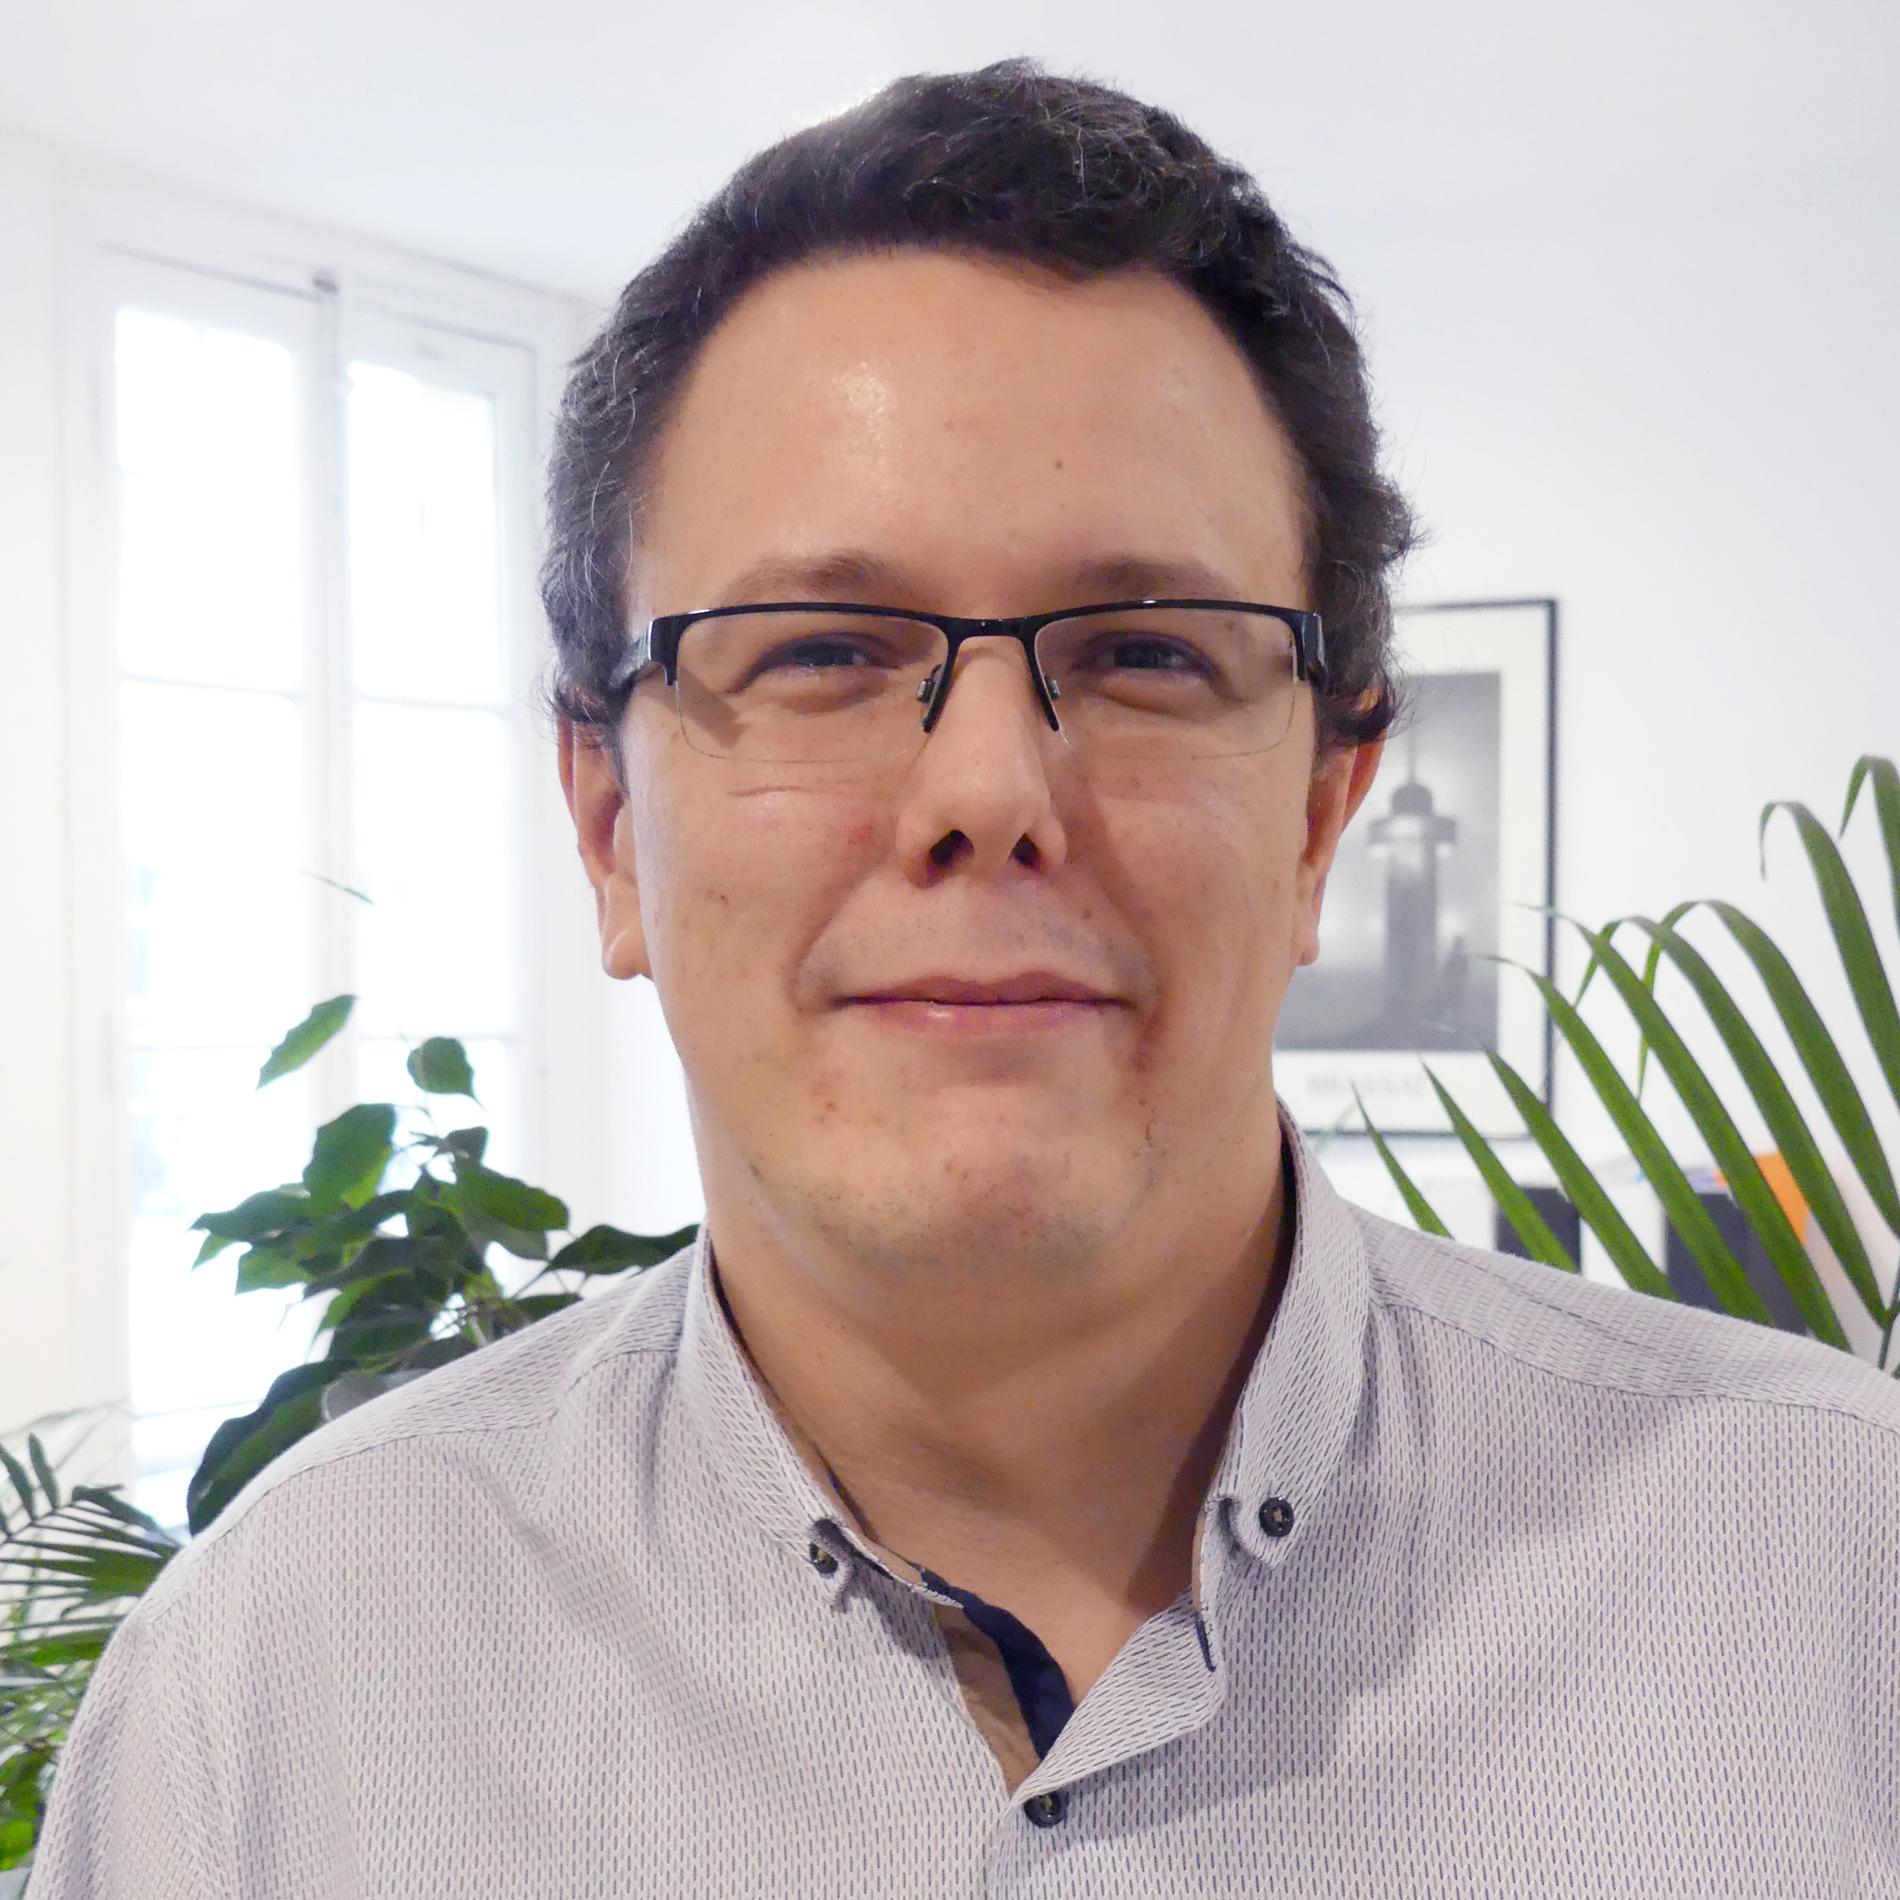 Charles LACROIX